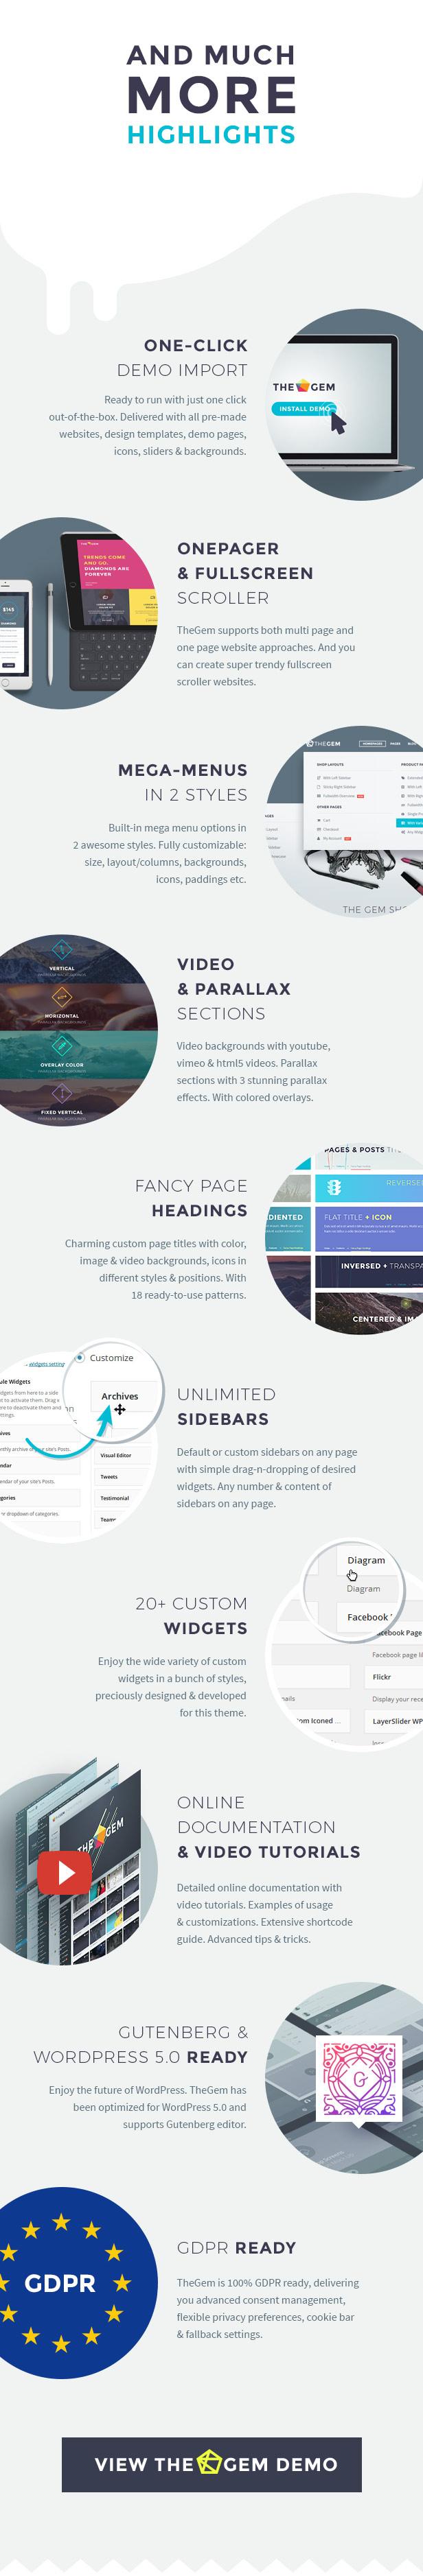 TheGem - Creative Multi-Purpose High-Performance WordPress Theme - 7